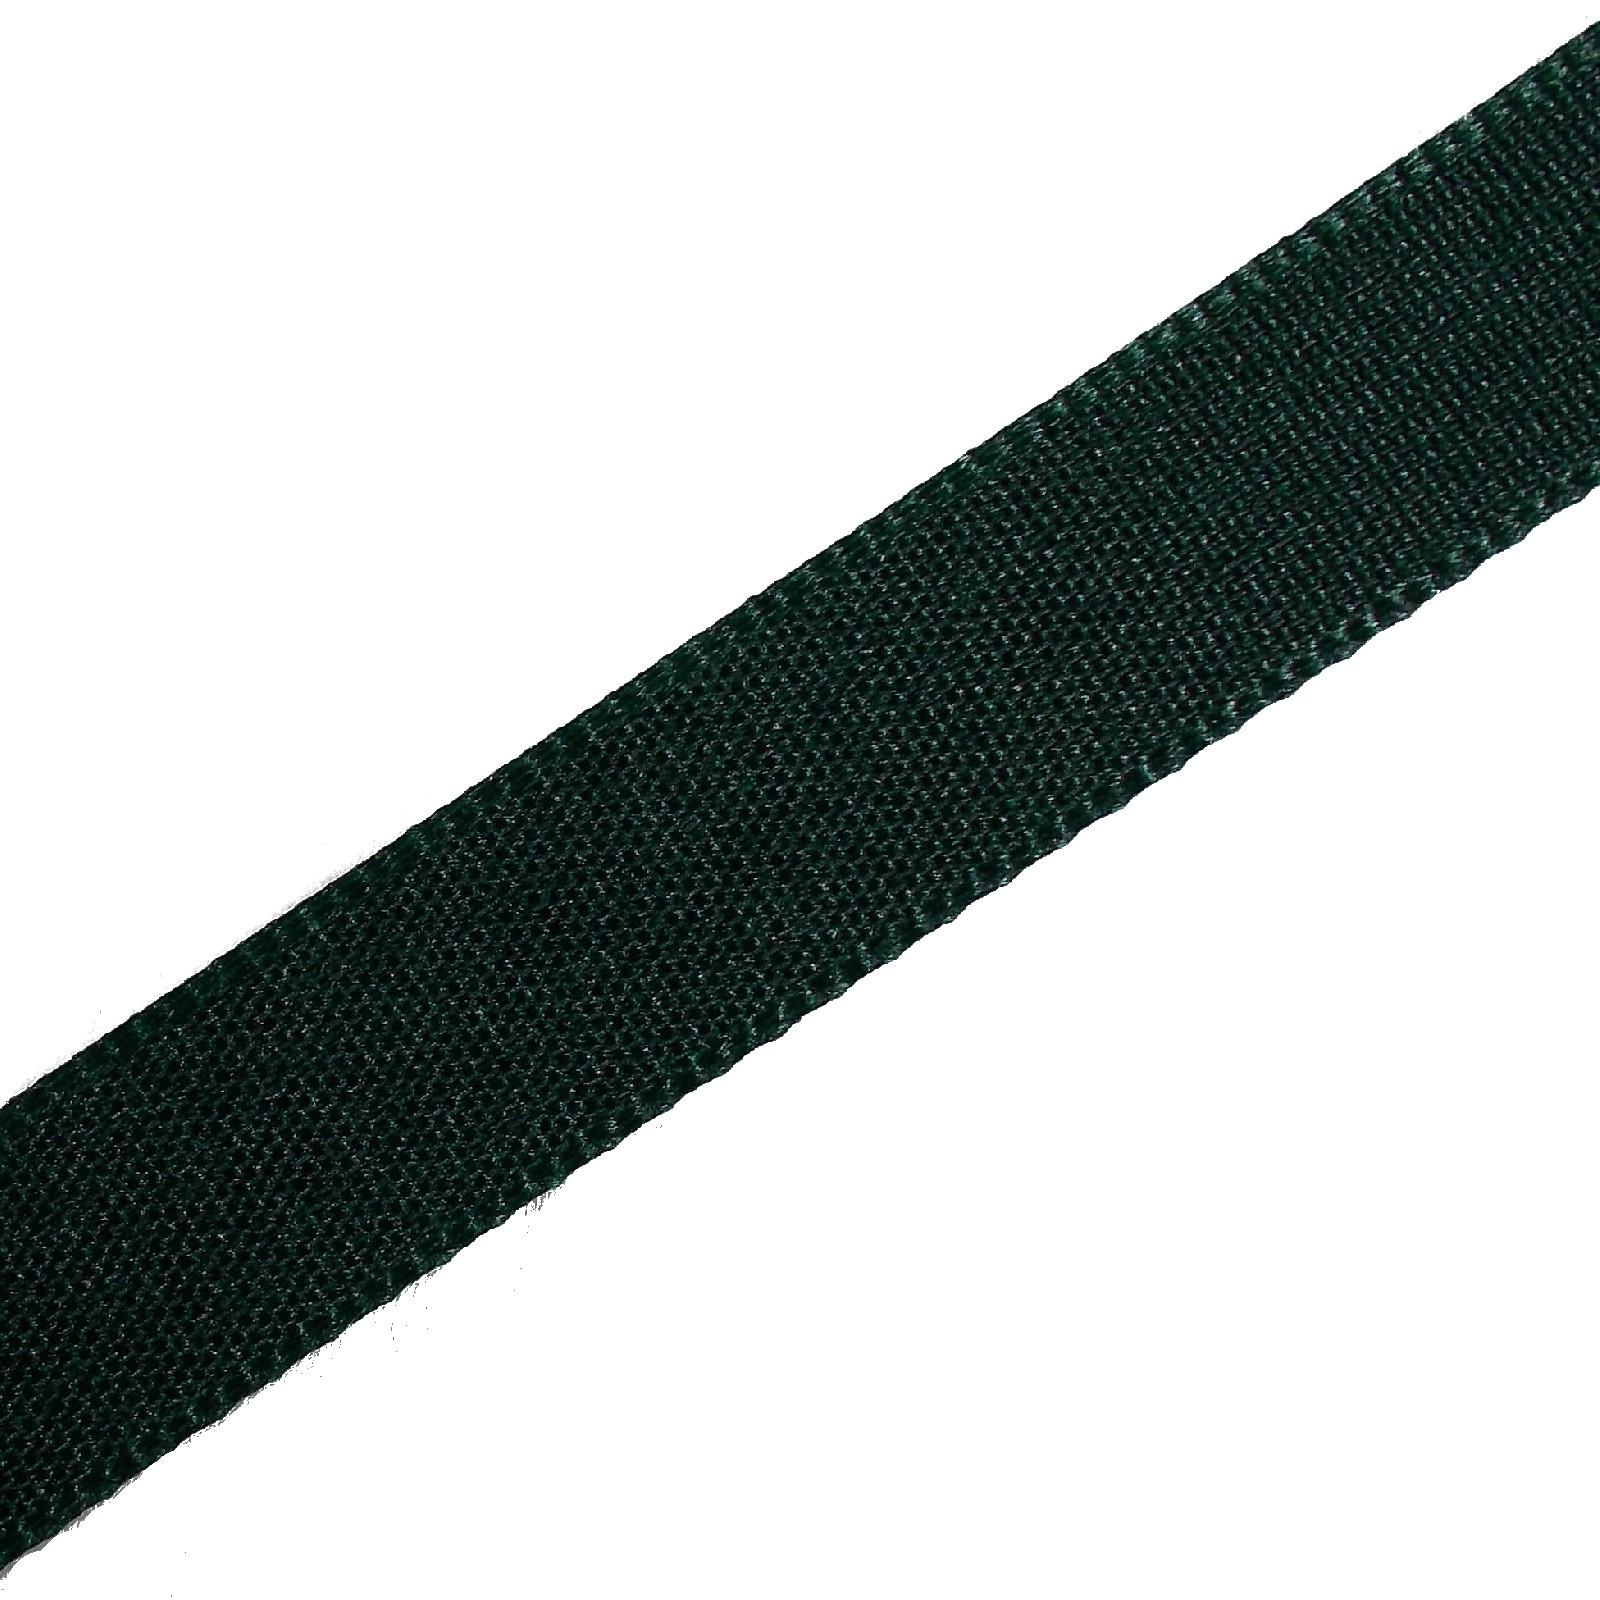 Berisfords Seam Binding Polyester Ribbon Tape 12mm wide Green 3 metre length